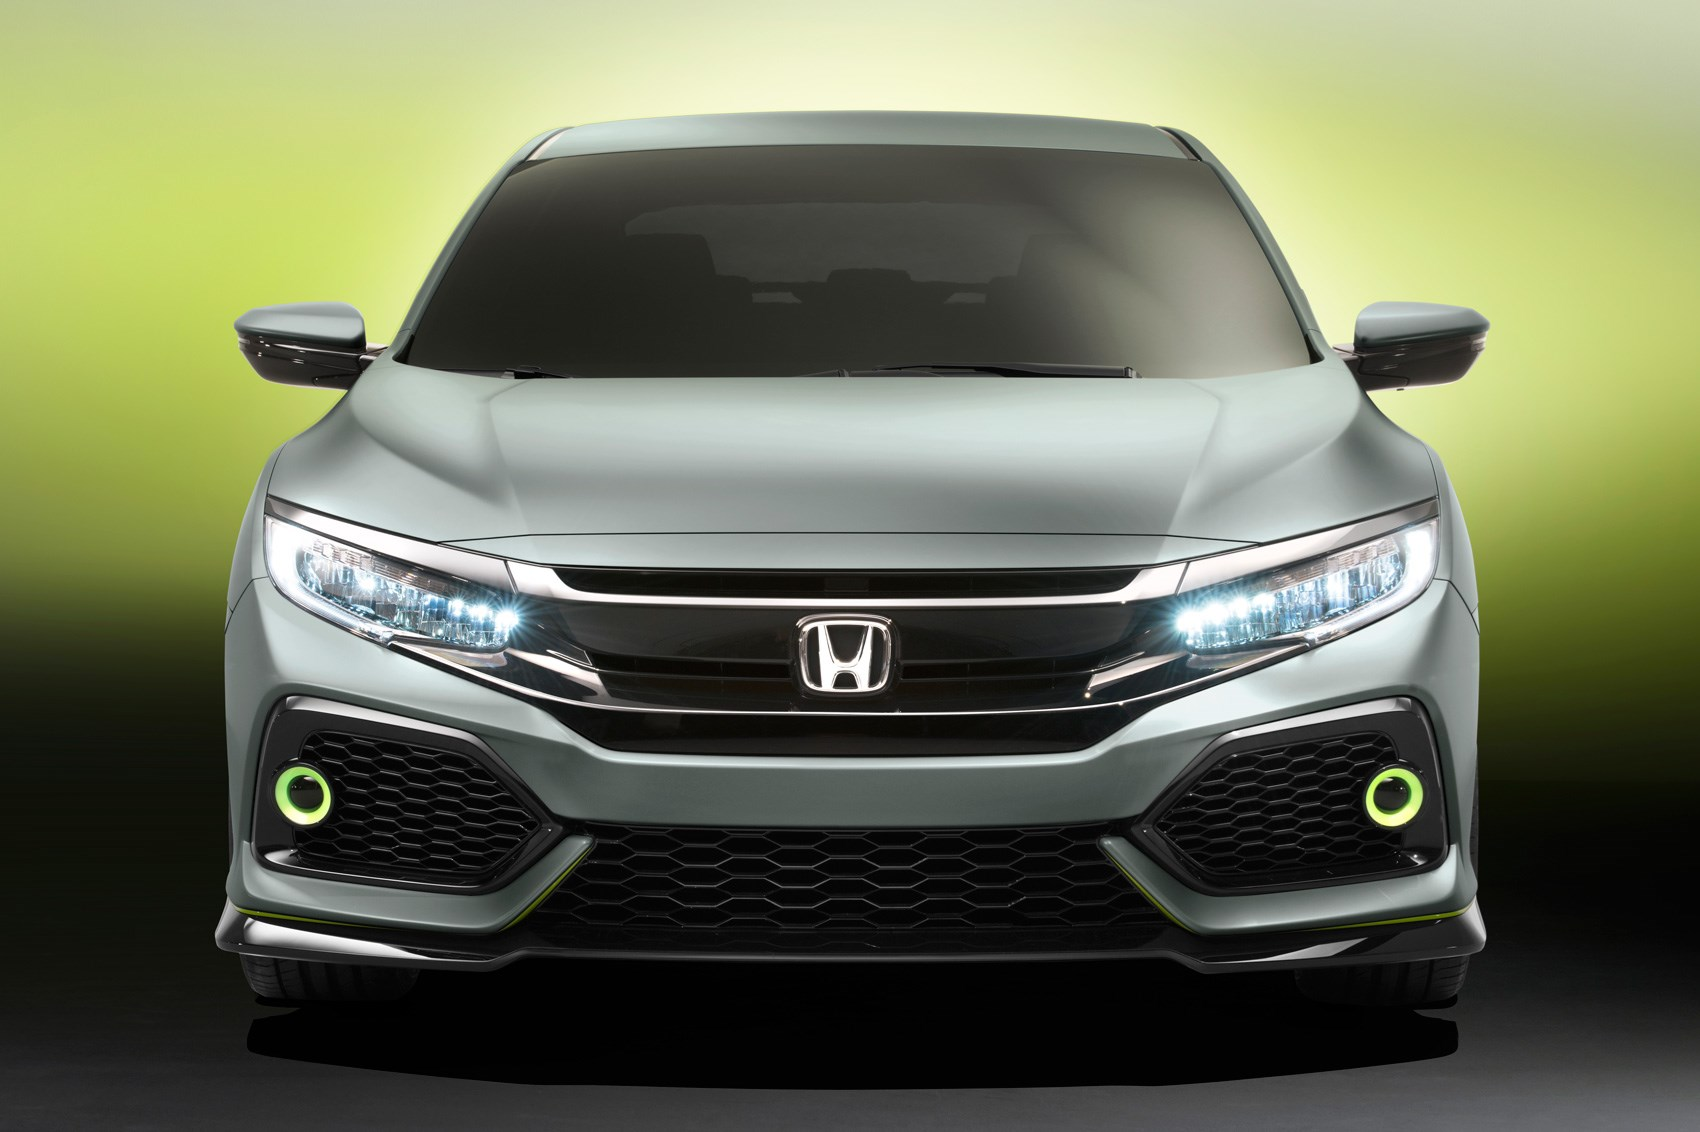 New 2017 Honda Civic Prototype Unveiled In Geneva By Car